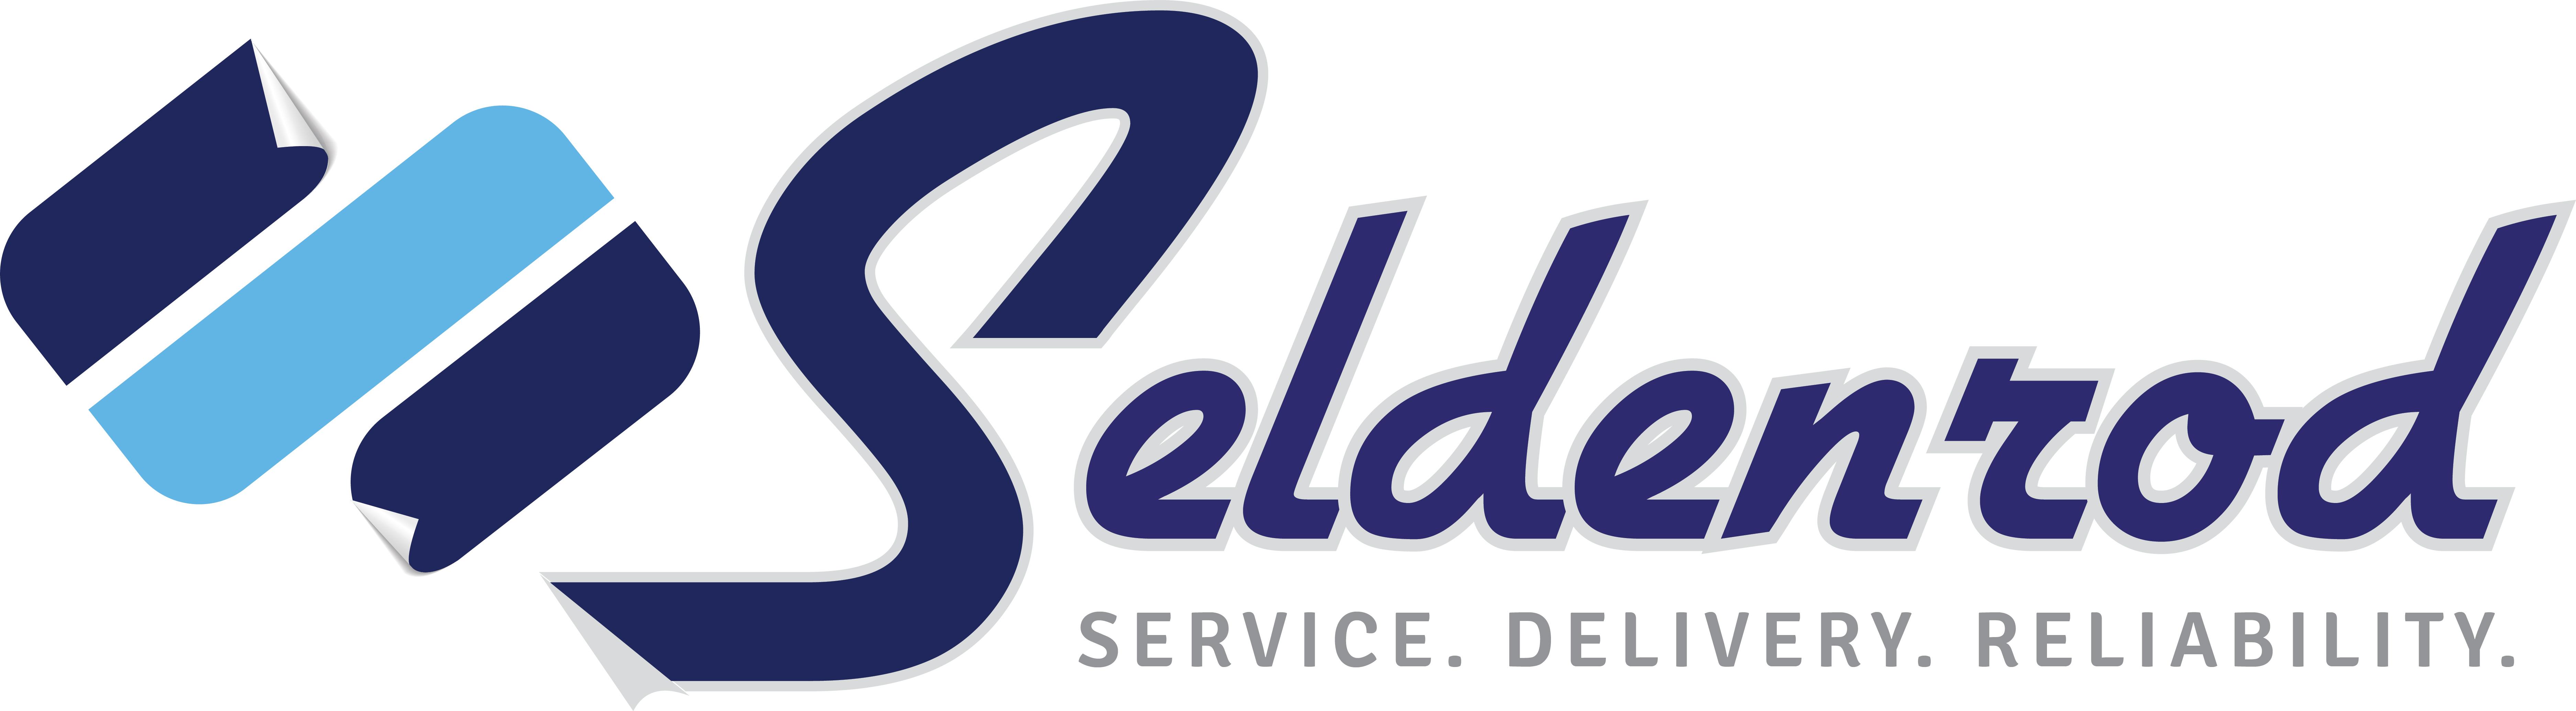 Seldenrod